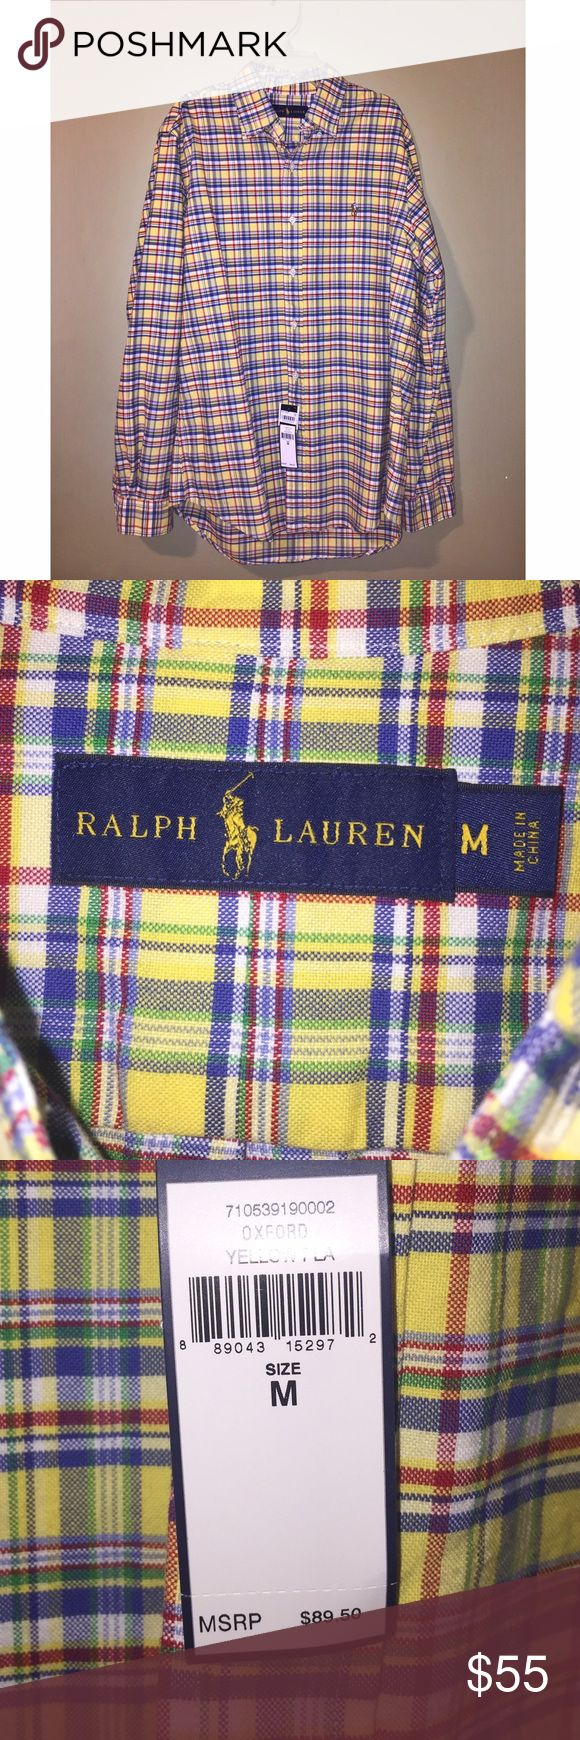 POLO RALPH LAUREN PLAID BUTTON DOWN This is a brand new with tags Polo Ralph Lauren Button Down shirt! It is a size Medium! Polo by Ralph Lauren Shirts Casual Button Down Shirts